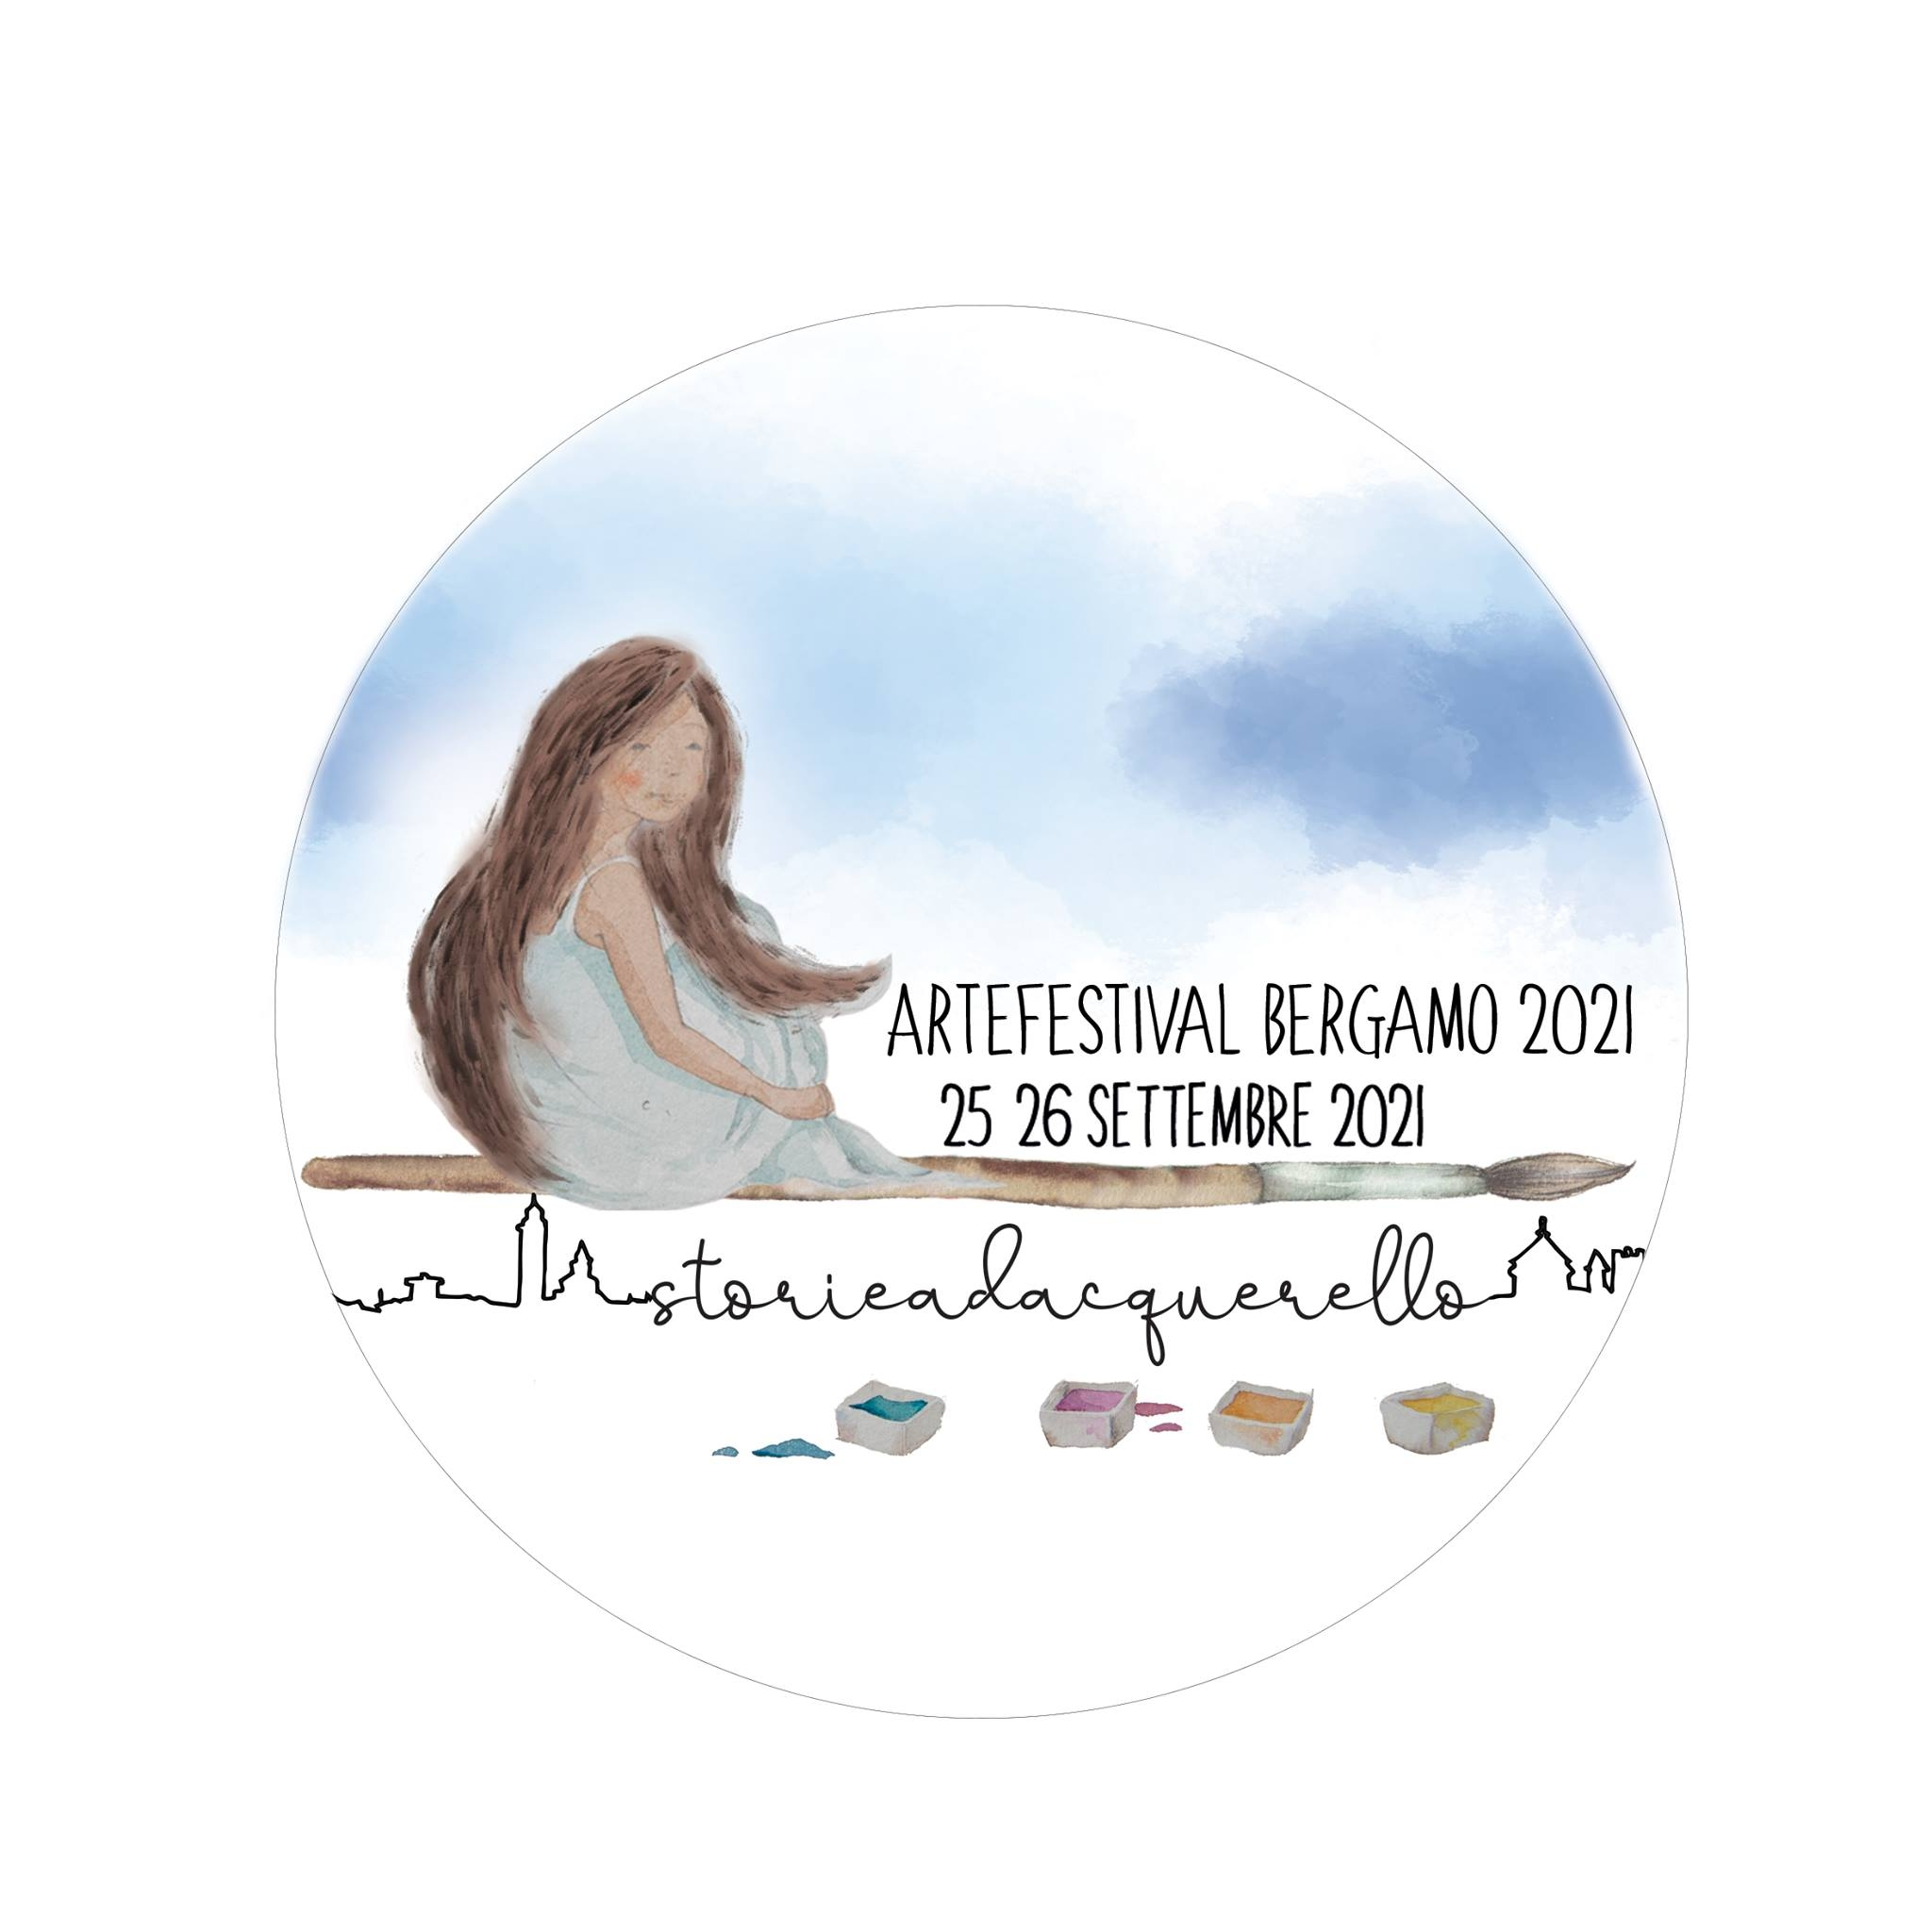 ArteFestival Bergamo 2021